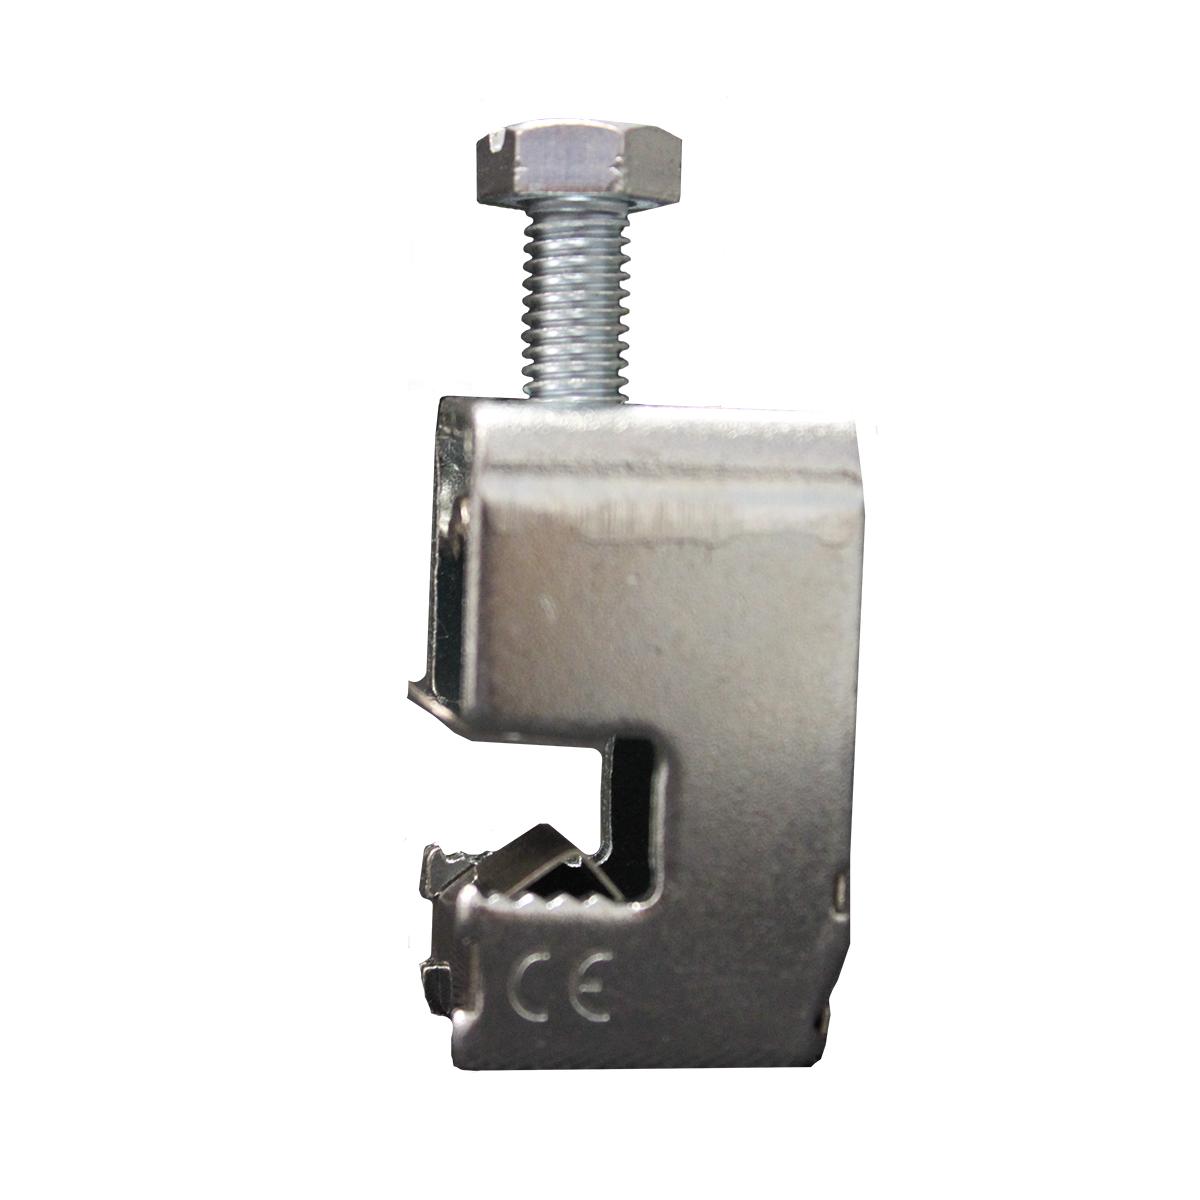 1 Stk Alu-Kupfer-Leiteranschlußklemme 1,5 -16mm² / 10mm² IS5051610-